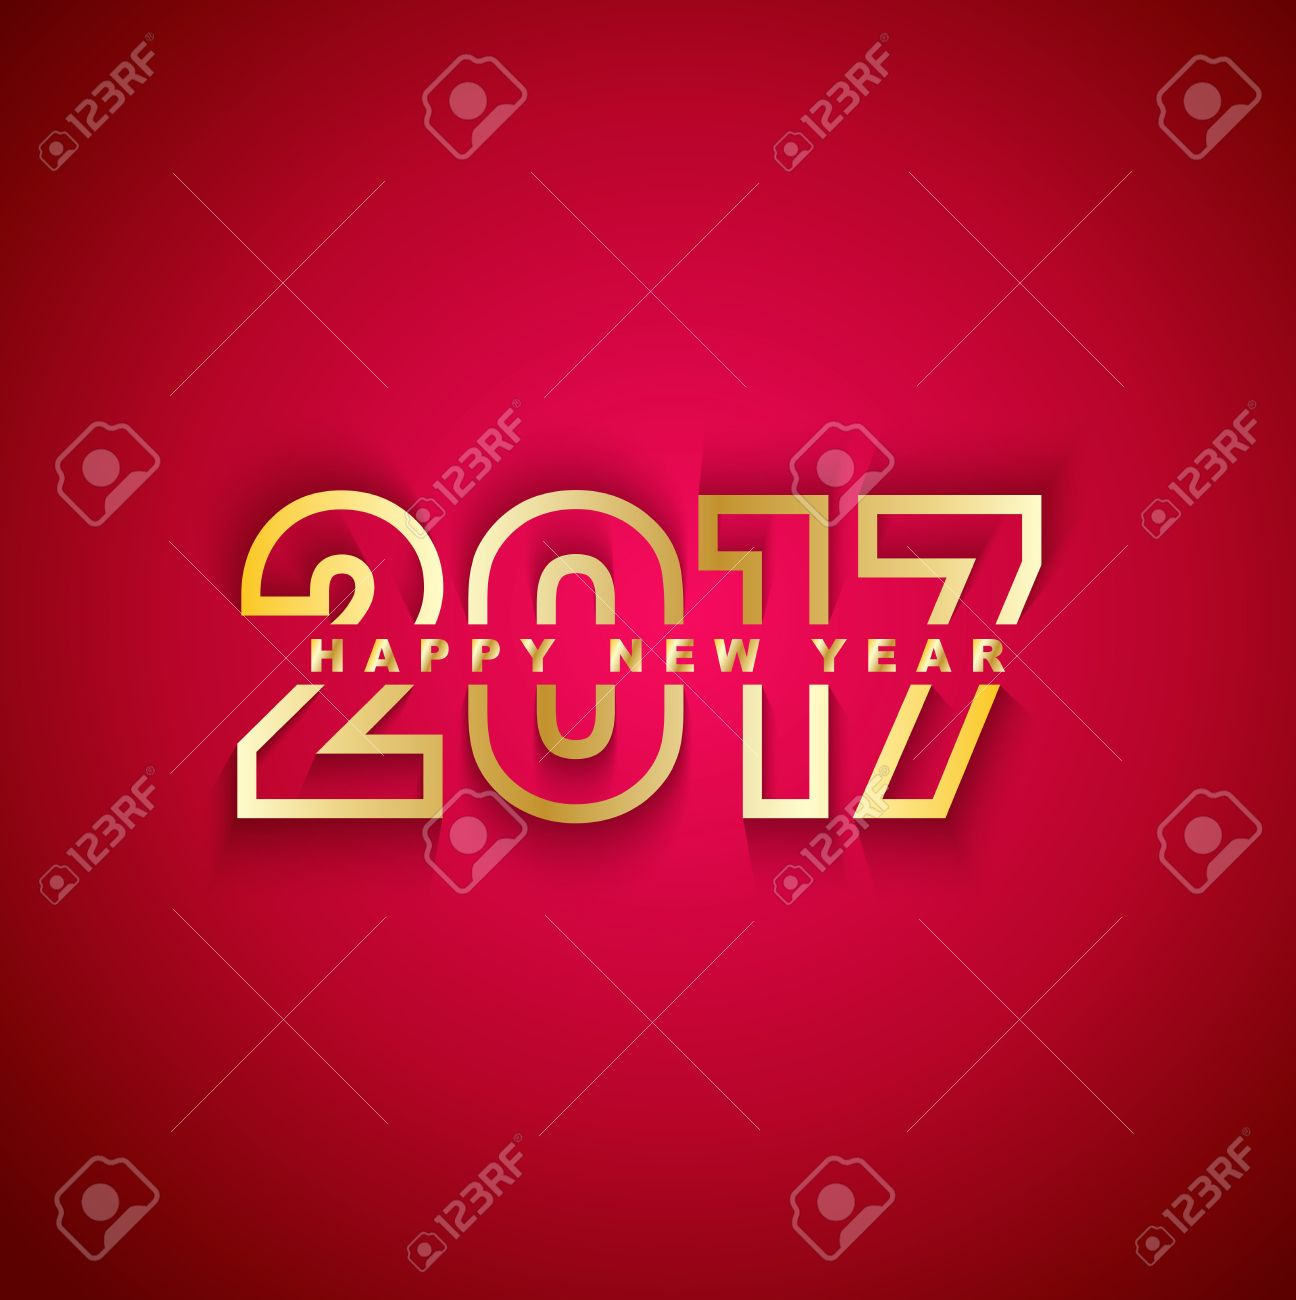 2017 Happy New Year - 44848931